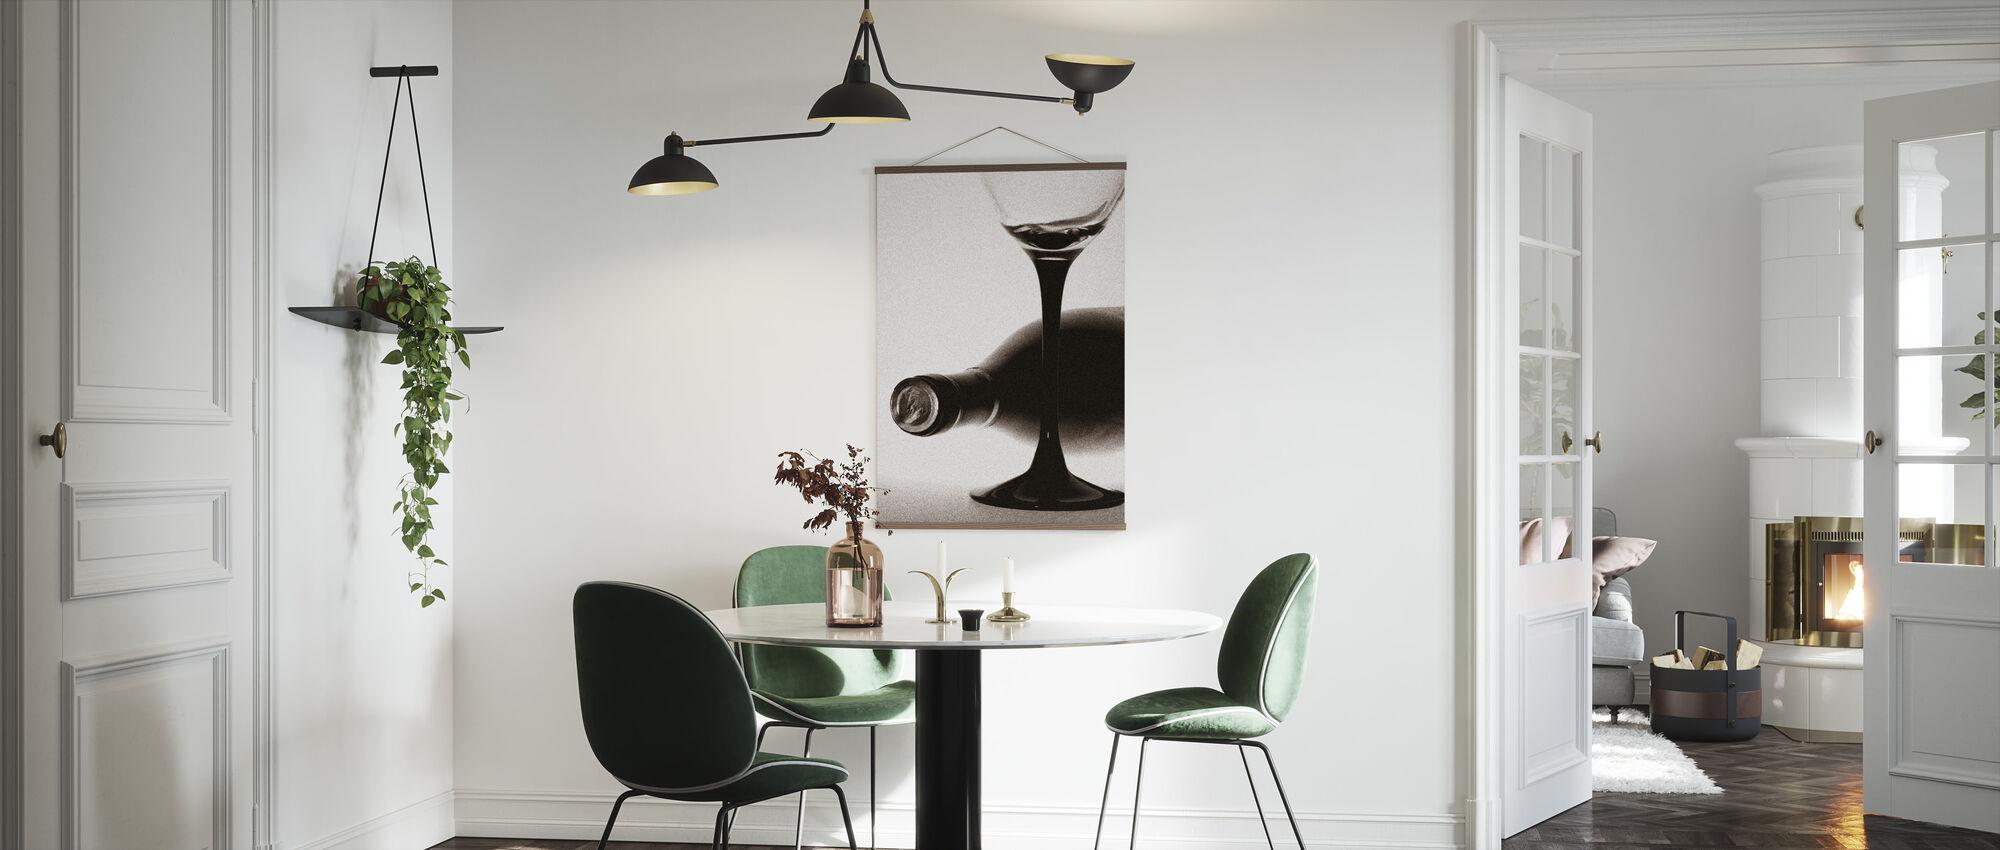 Grainy Winebottle - Poster - Kitchen